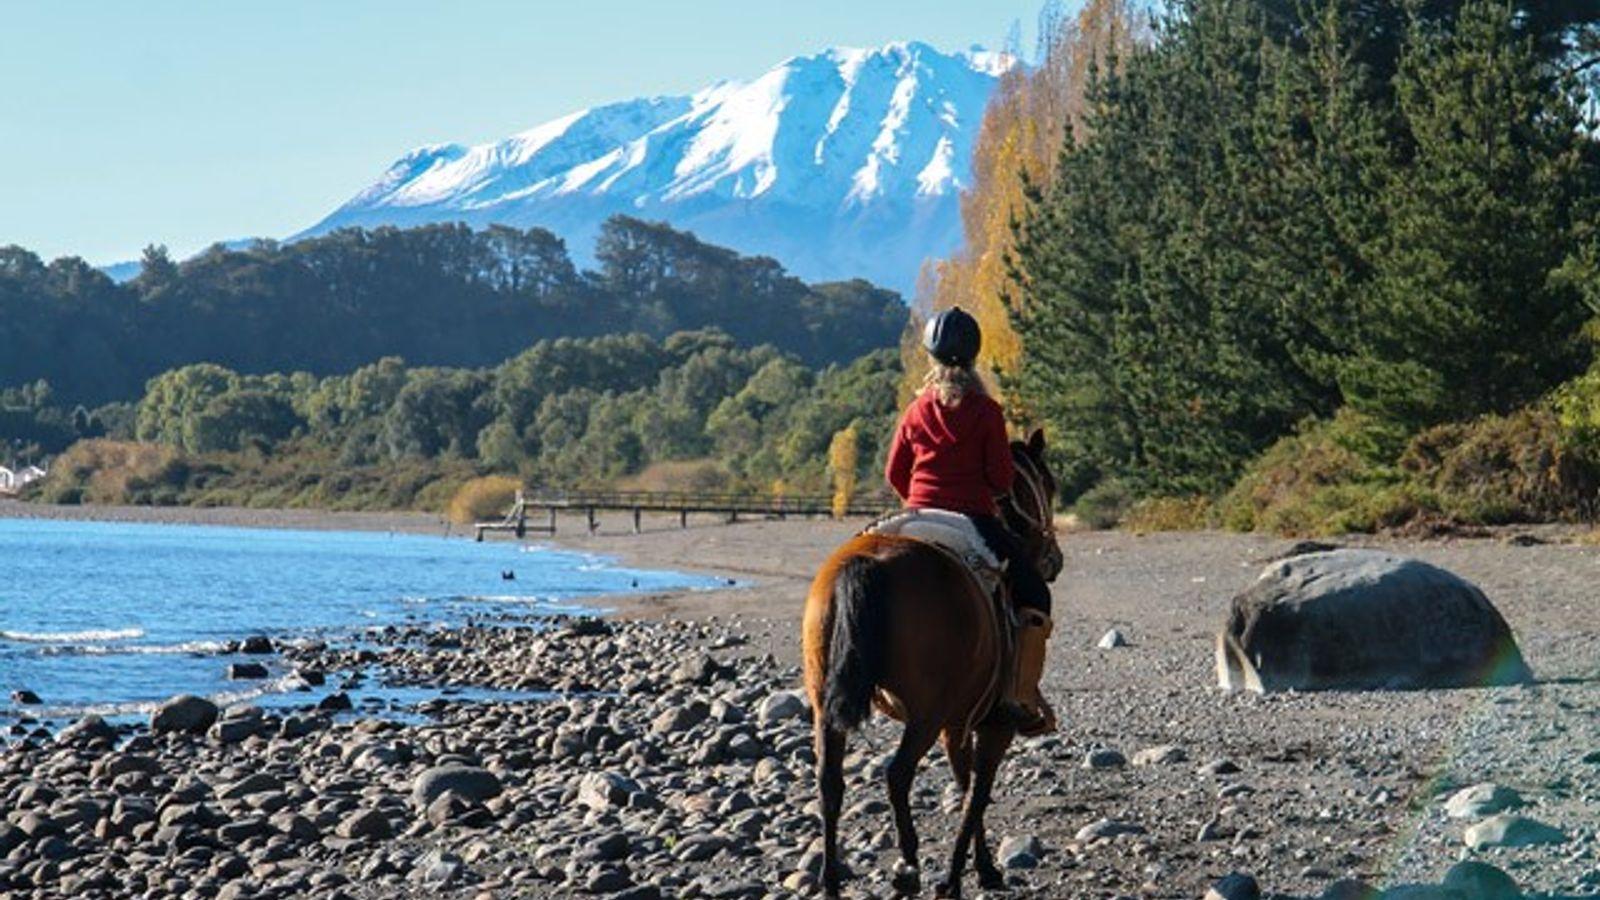 On horseback with views over Lake Llanquihue, Puerto Rosales Peninsula.